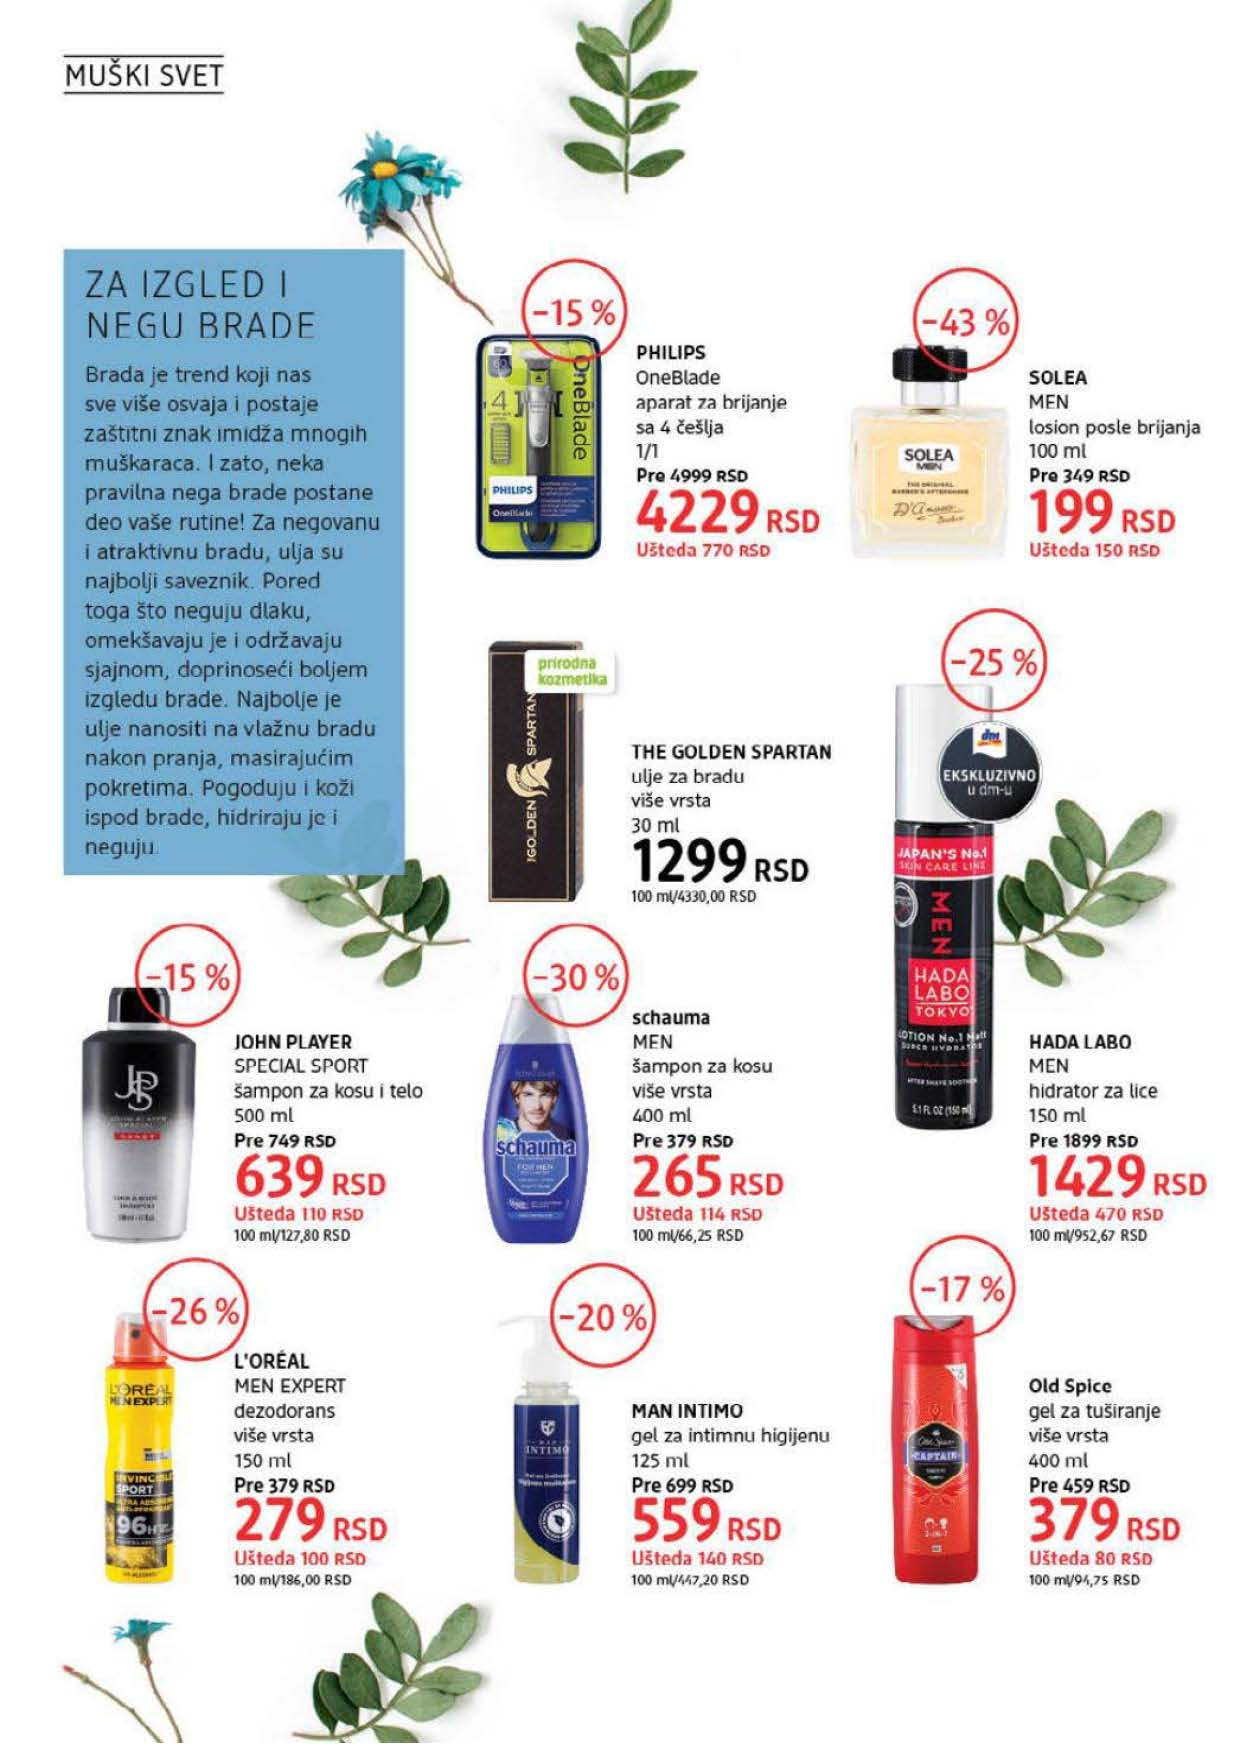 DM Katalog Srbija SEPTEMBAR 2021 1.9.2021. 30.9.2021. Page 22